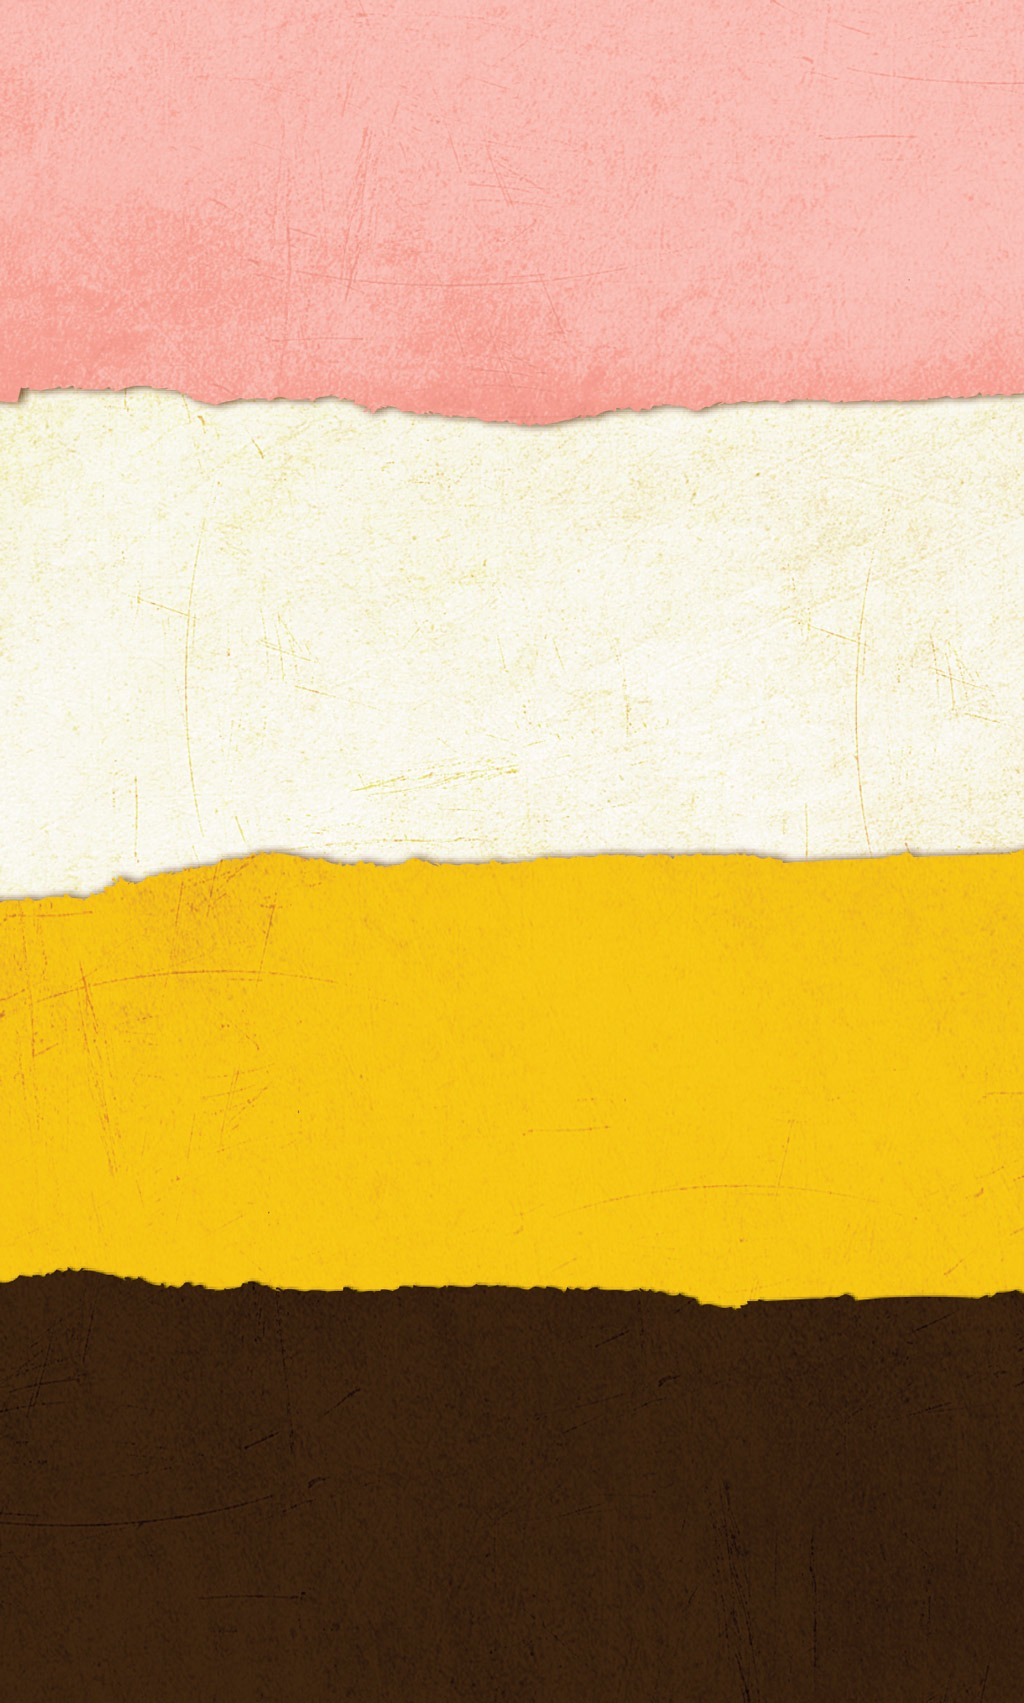 h0rse-portfolio-Meine-kleine-Farm-texture_mobile